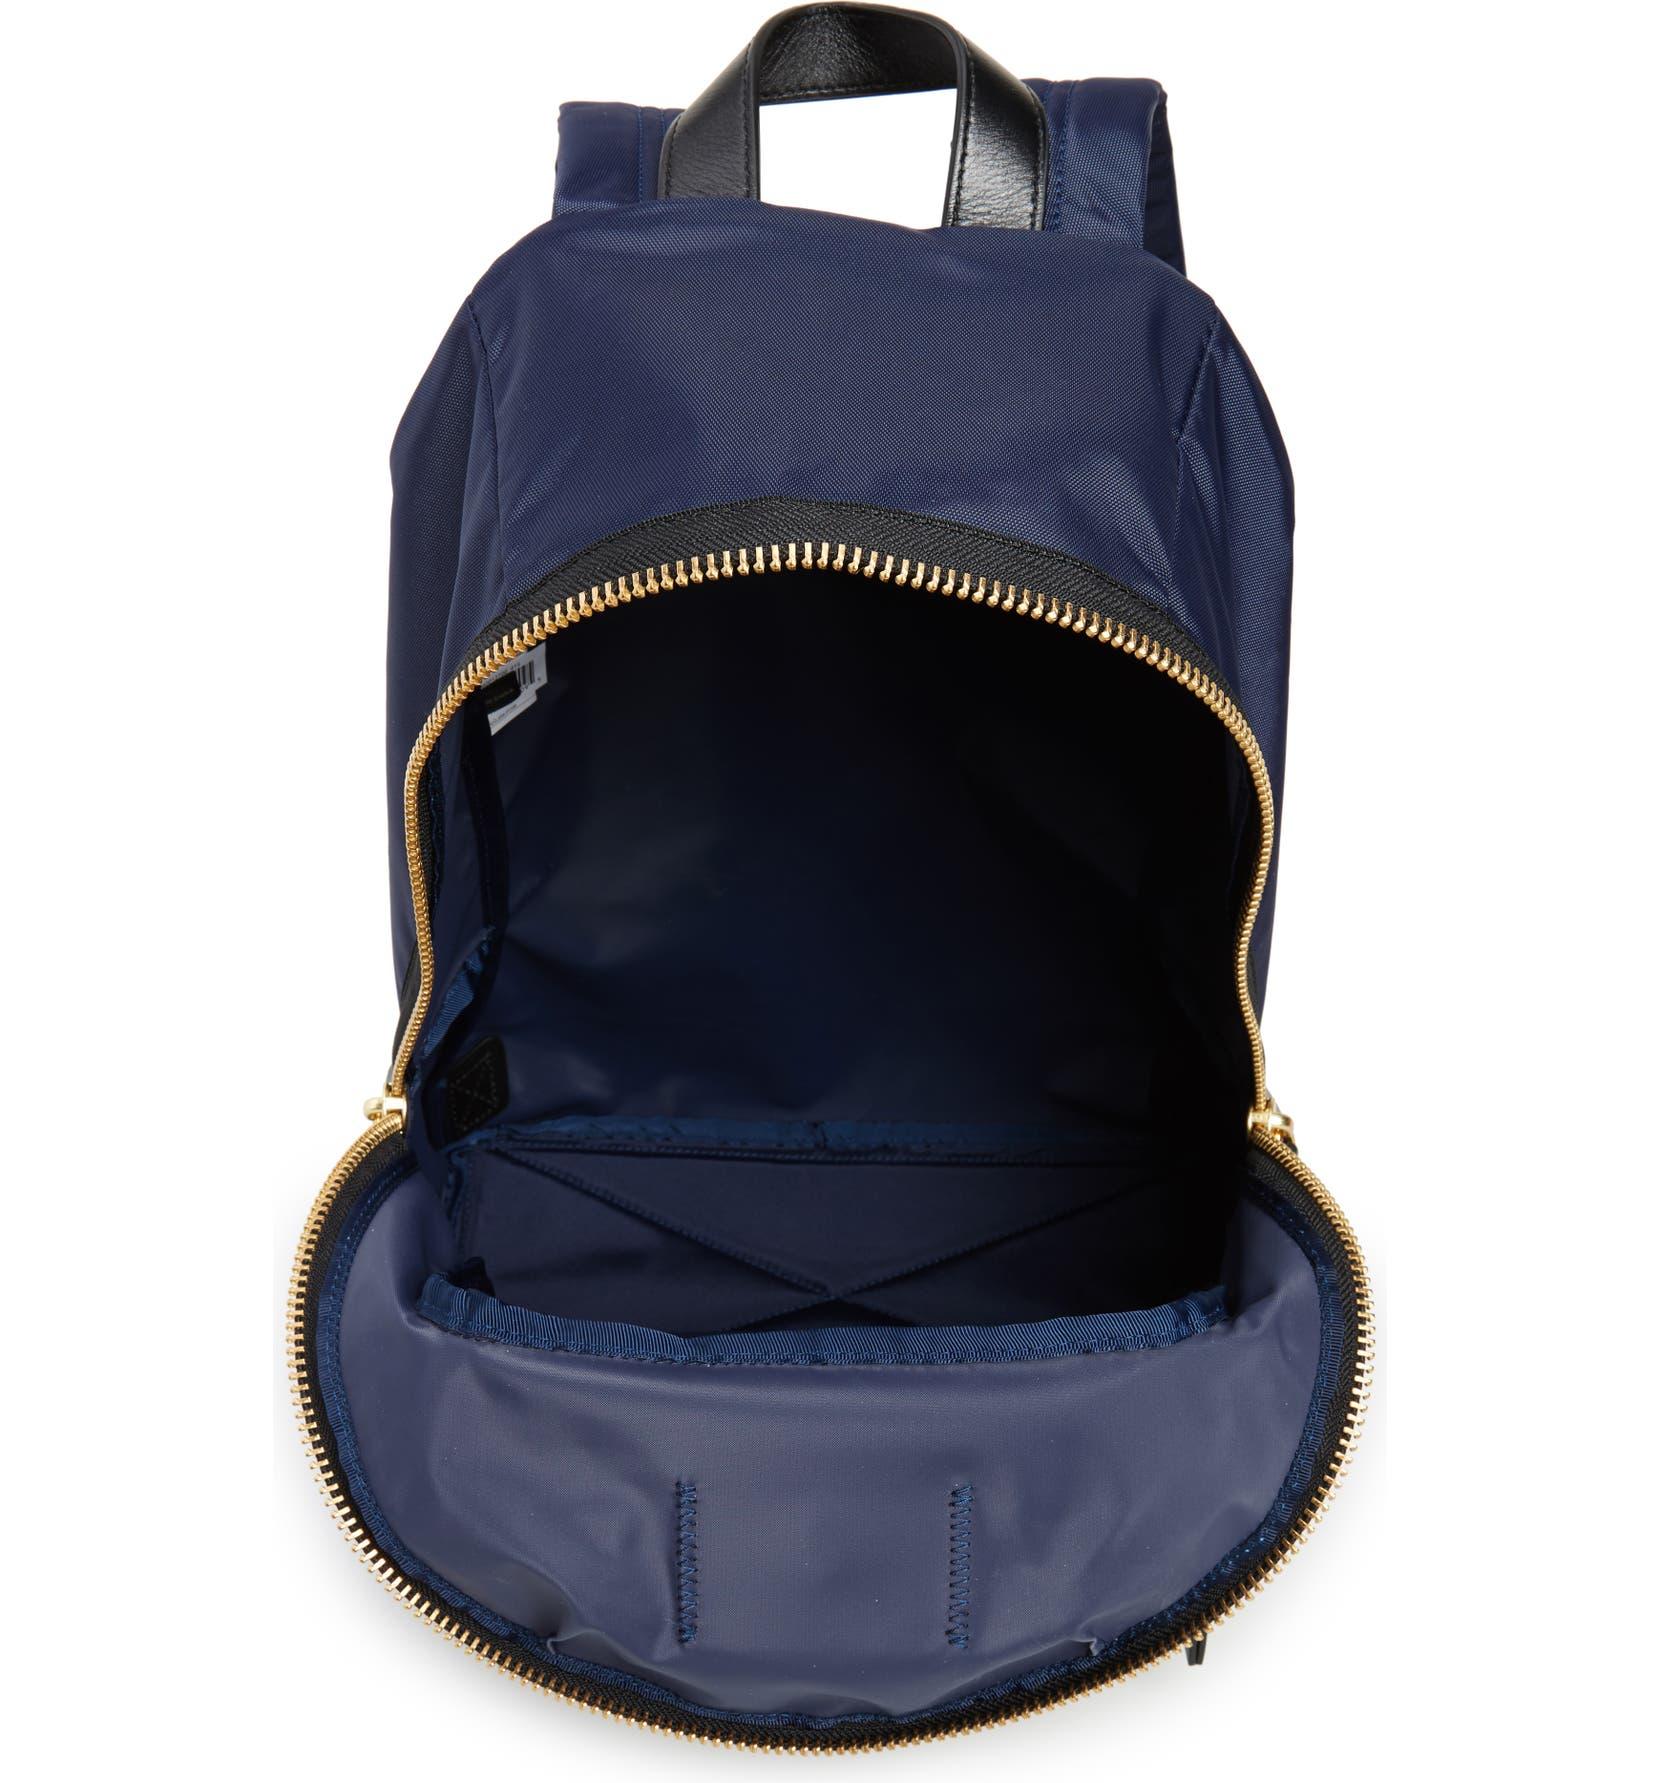 09c1f525dd9c5 Marc Jacobs Black Nylon Biker Backpack | Building Materials Bargain ...